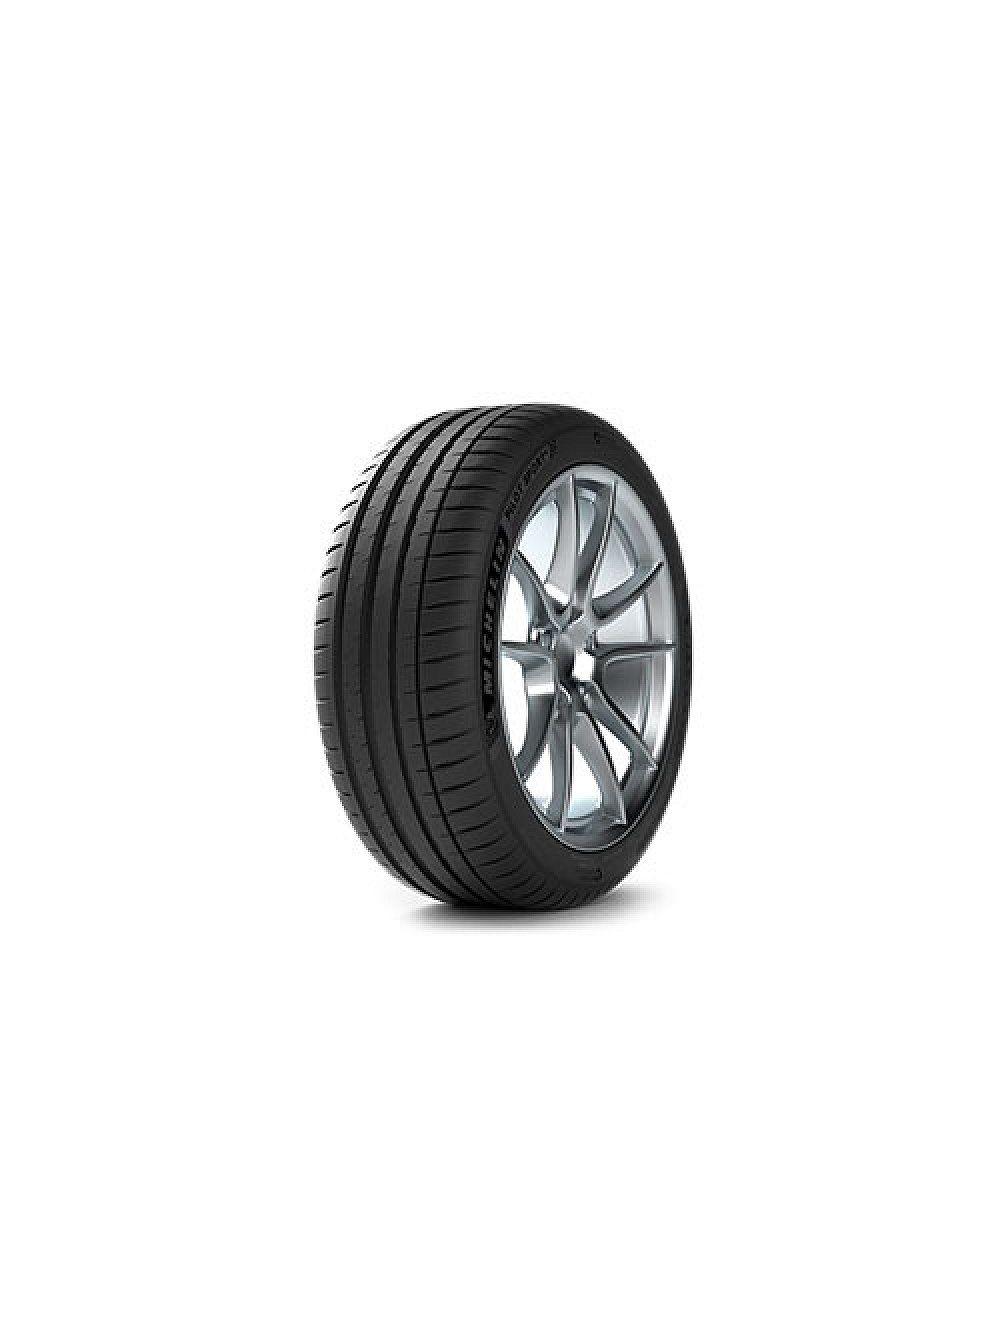 Michelin 265/35R20 Y Pilot Sport4 S XL MO1 Nyári gumi